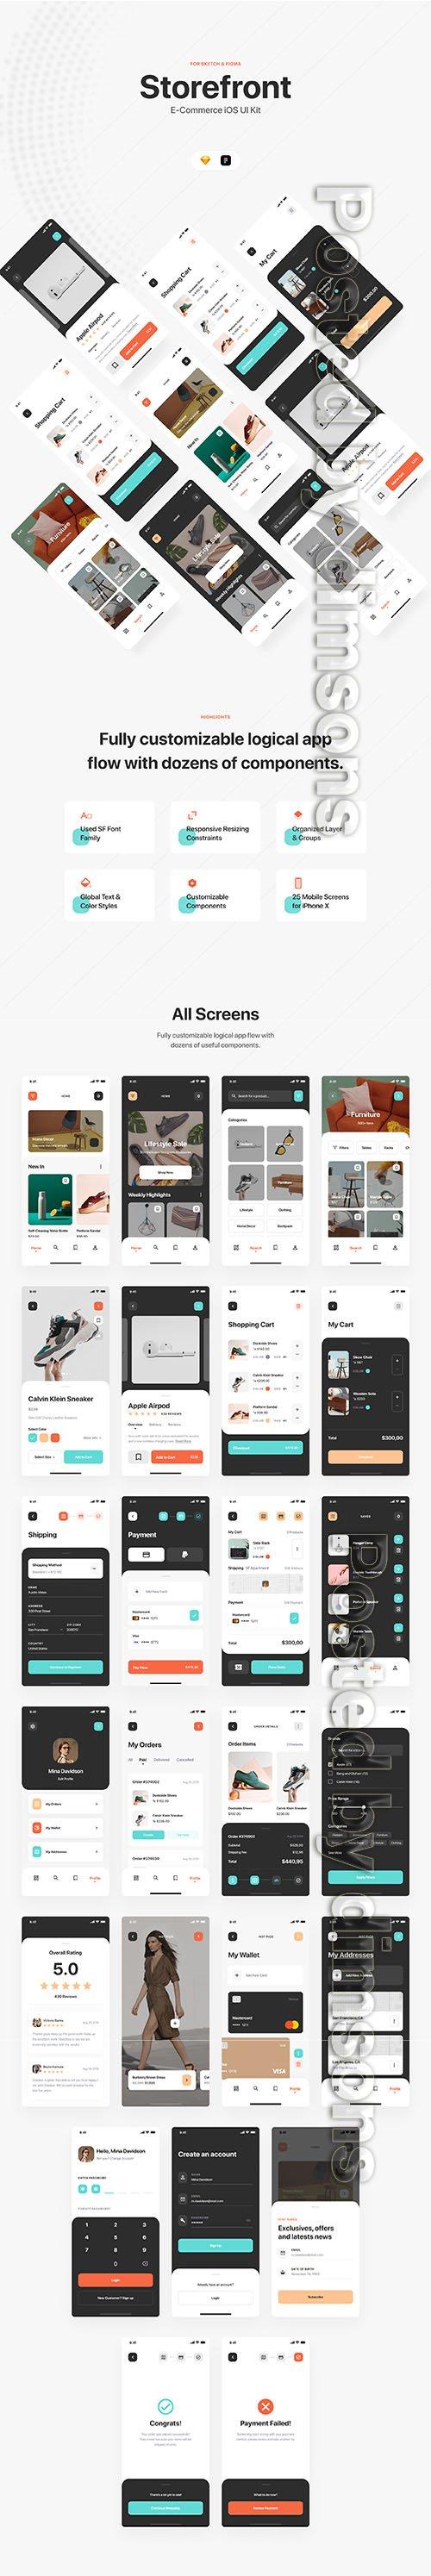 Storefront iOS UI Kit - UI8